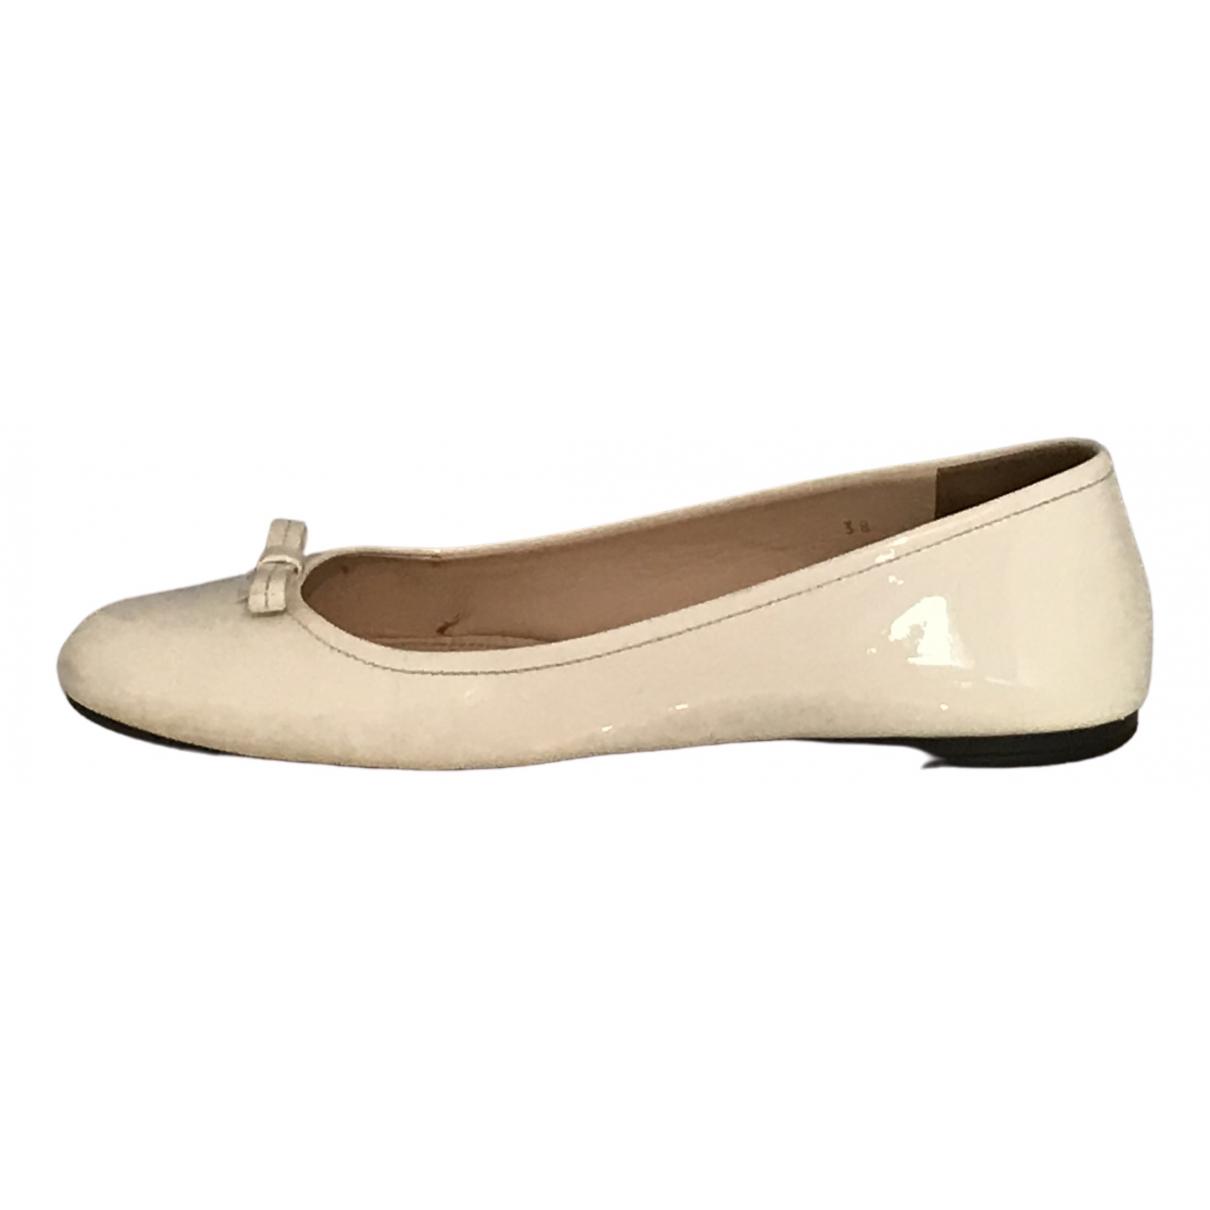 Prada \N White Patent leather Ballet flats for Women 38 EU